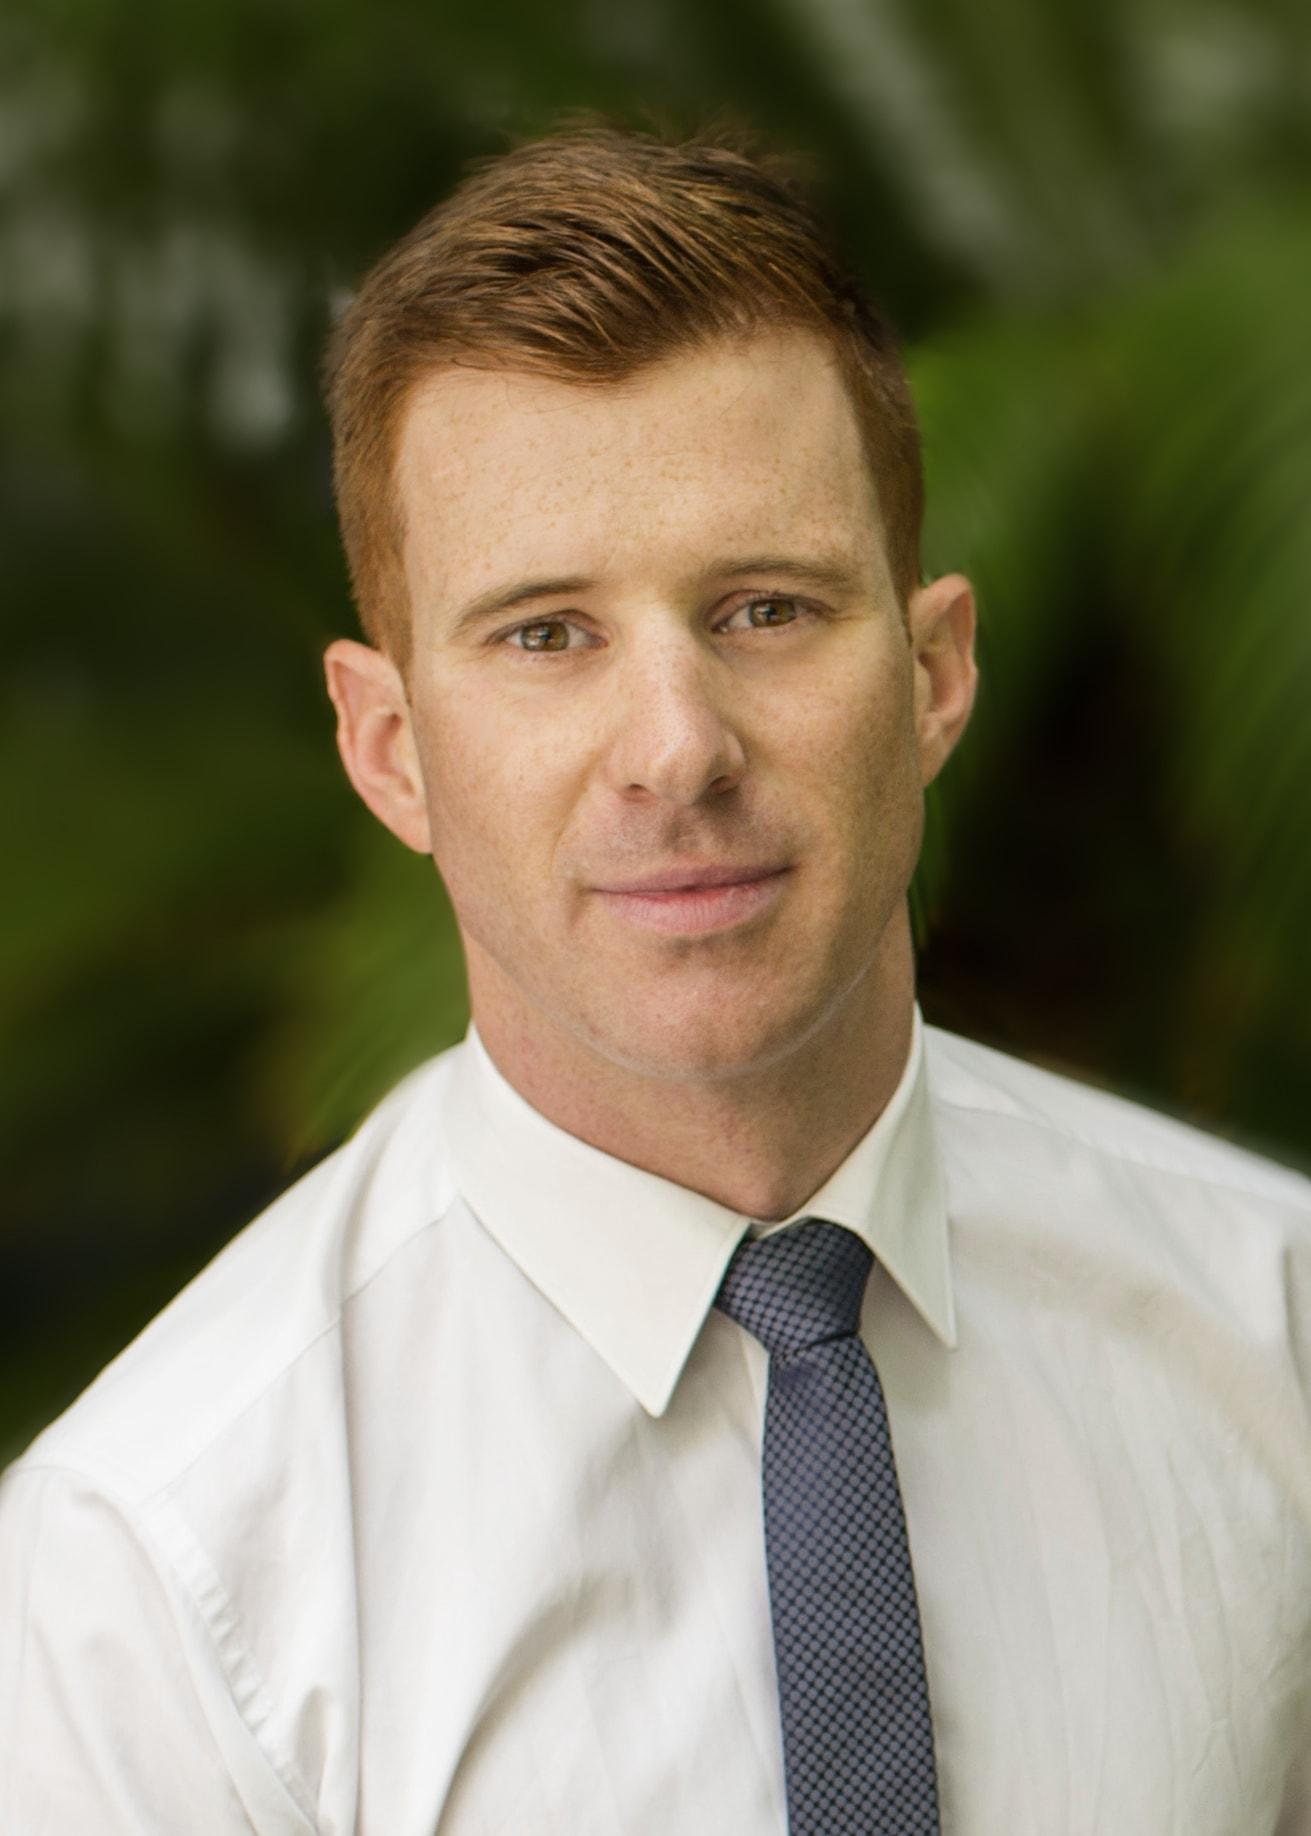 Ryan Woodhouse